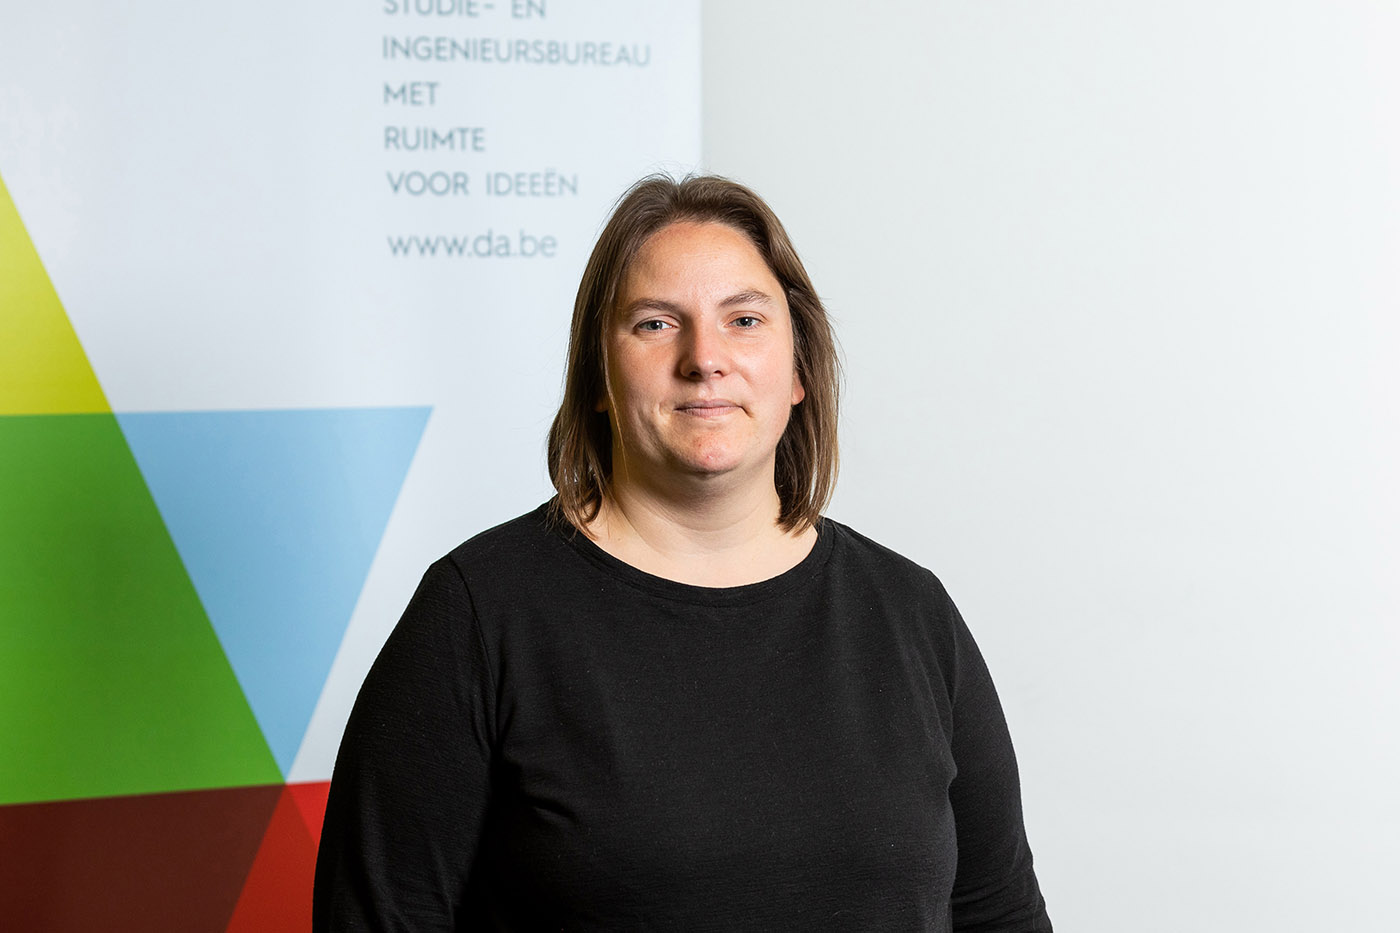 Mieke Colman_ingenieur